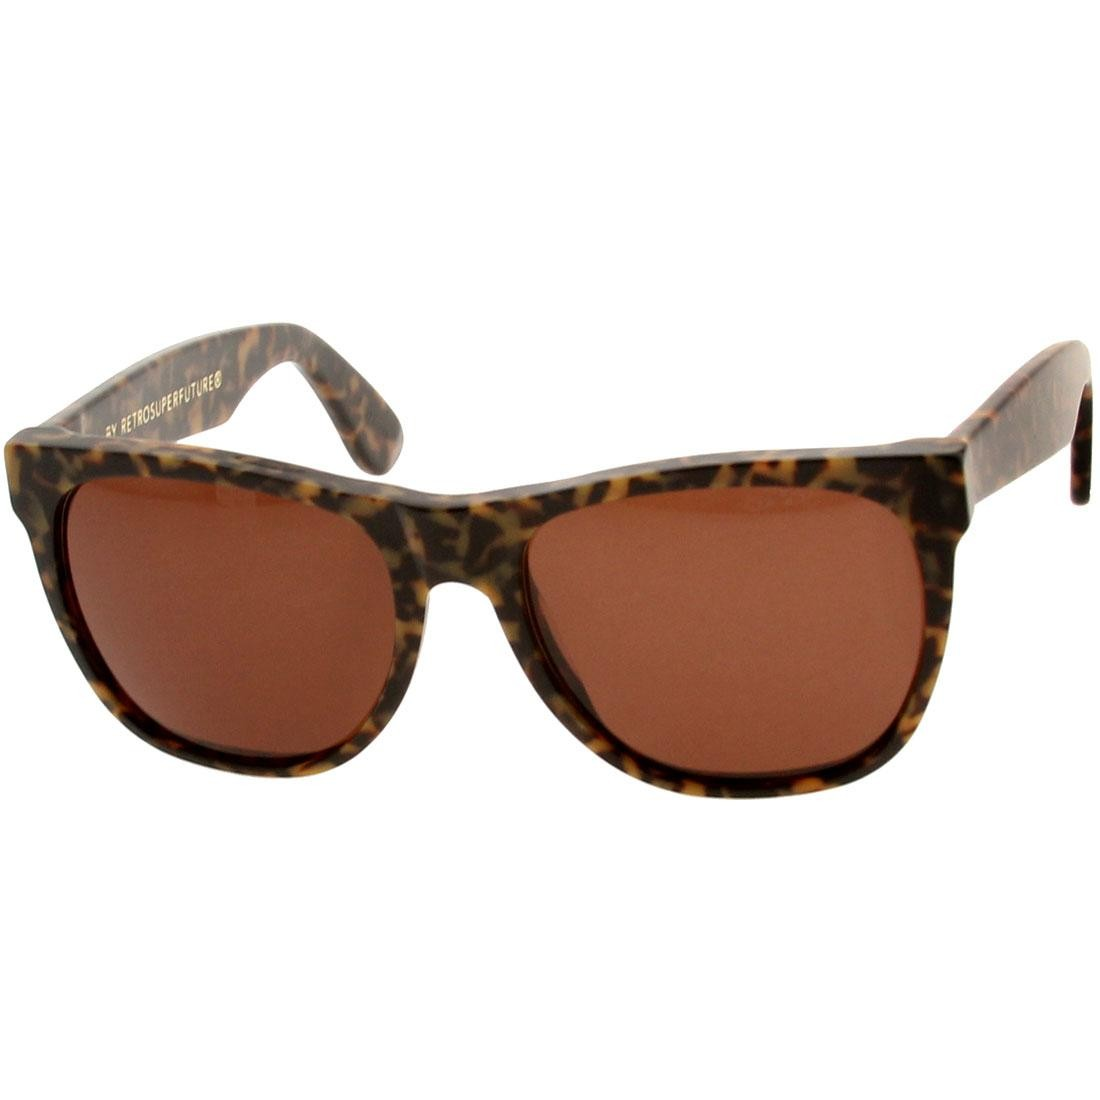 Super Sunglasses Classic Havana (brown / tortoise)